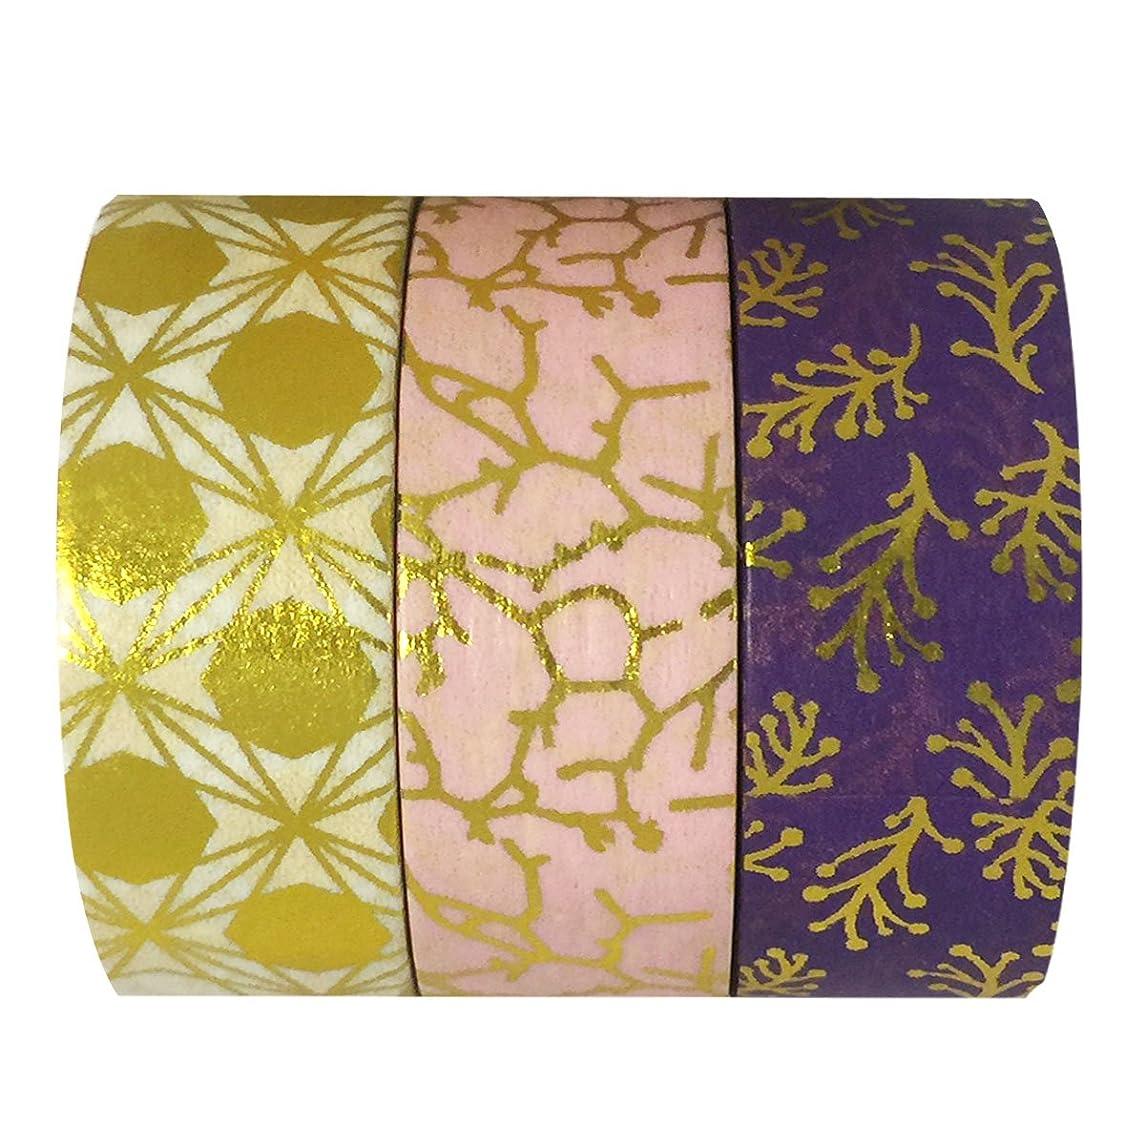 allydrew A70119 10M L x 15mm W Set of 3 Washi Masking Tape, Pink and Purple Metallic